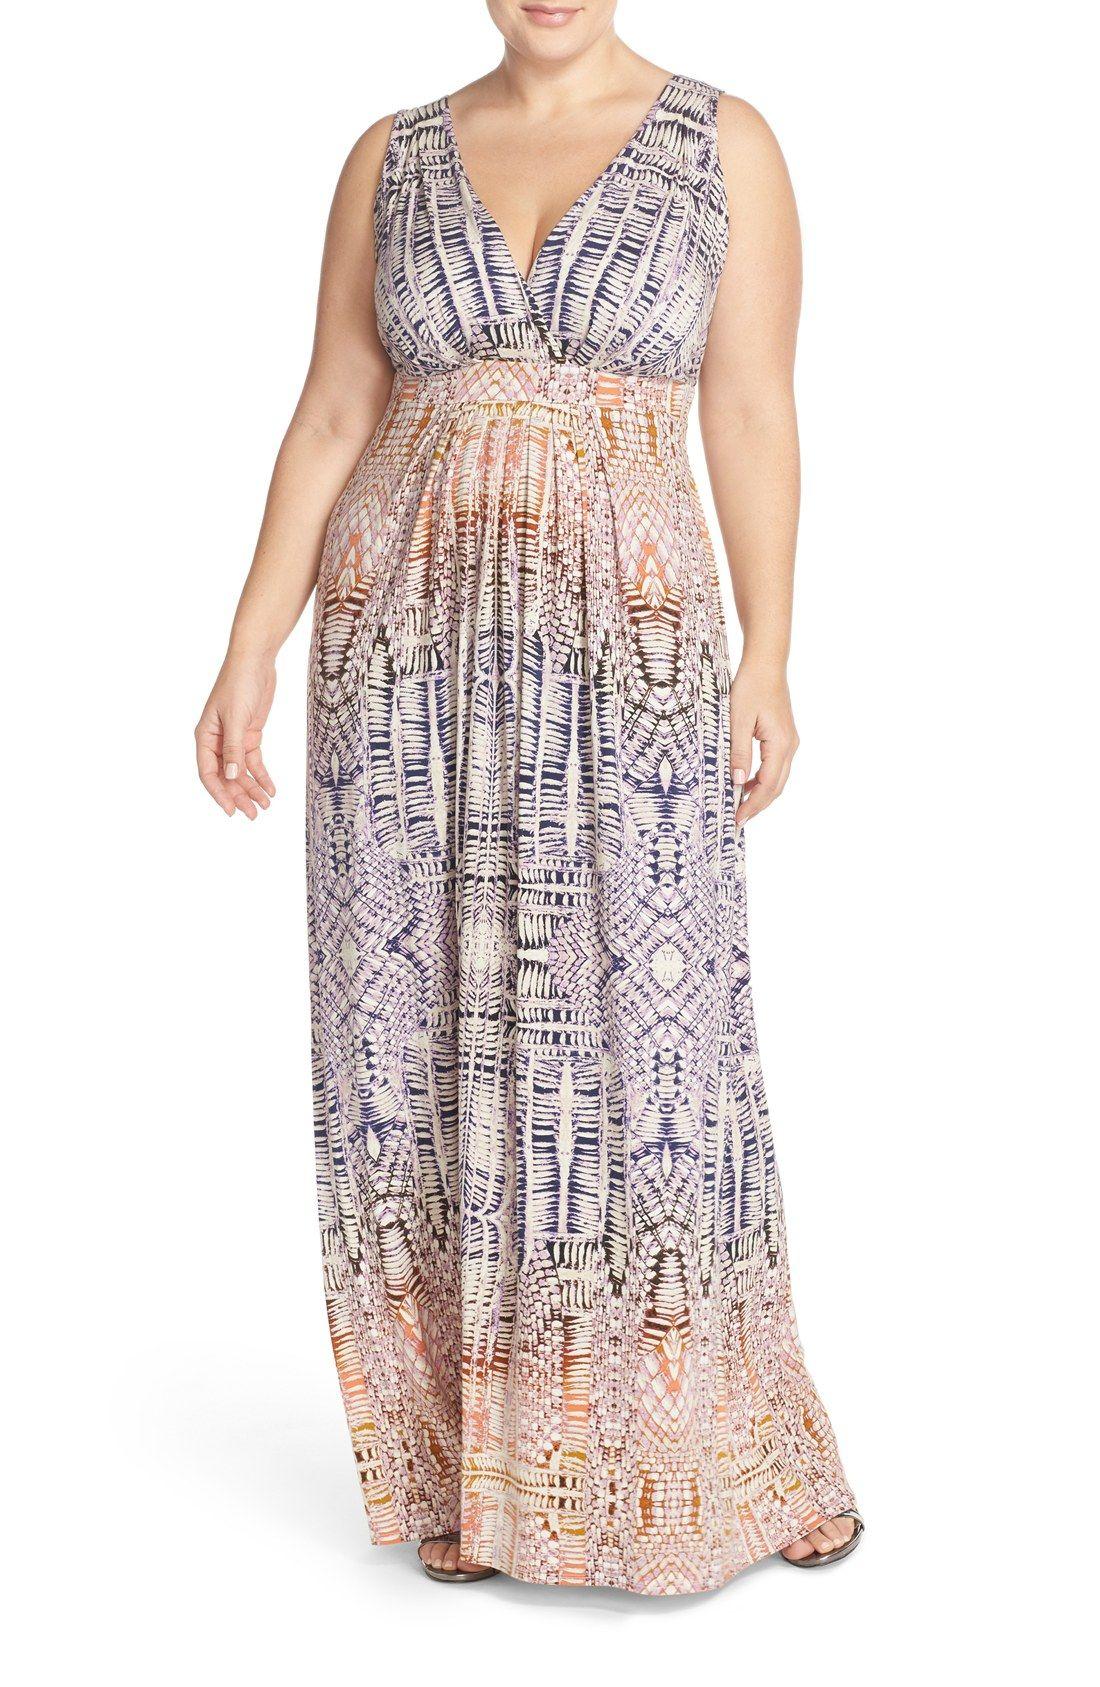 03d055aab Tart 'Chloe' Print Empire Waist Jersey Maxi Dress (Plus Size ...